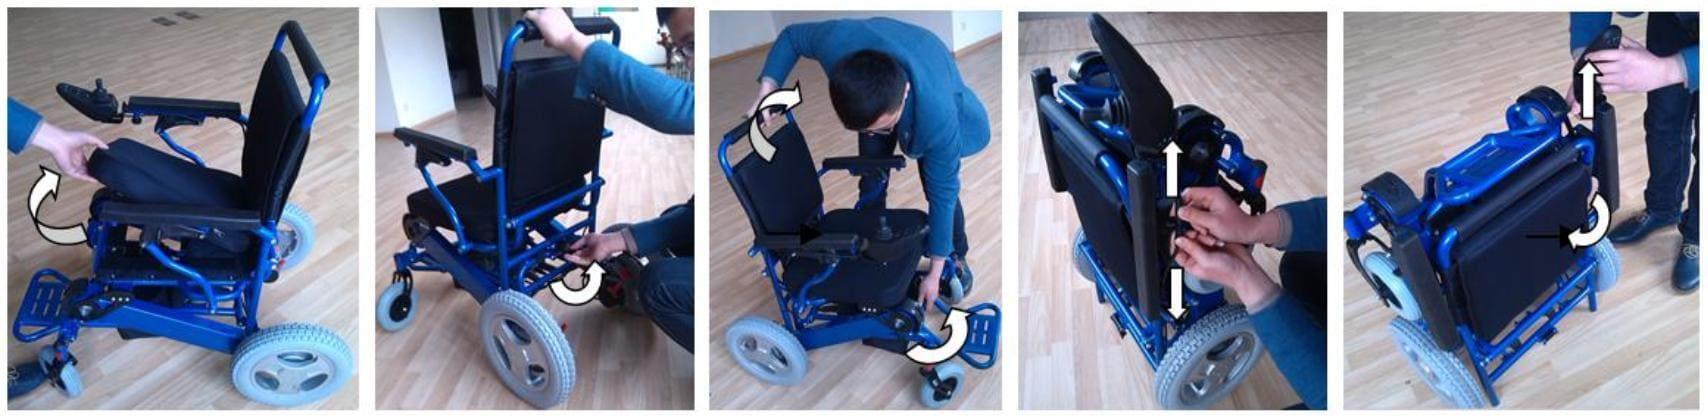 Powered Wheel Chair folding steps